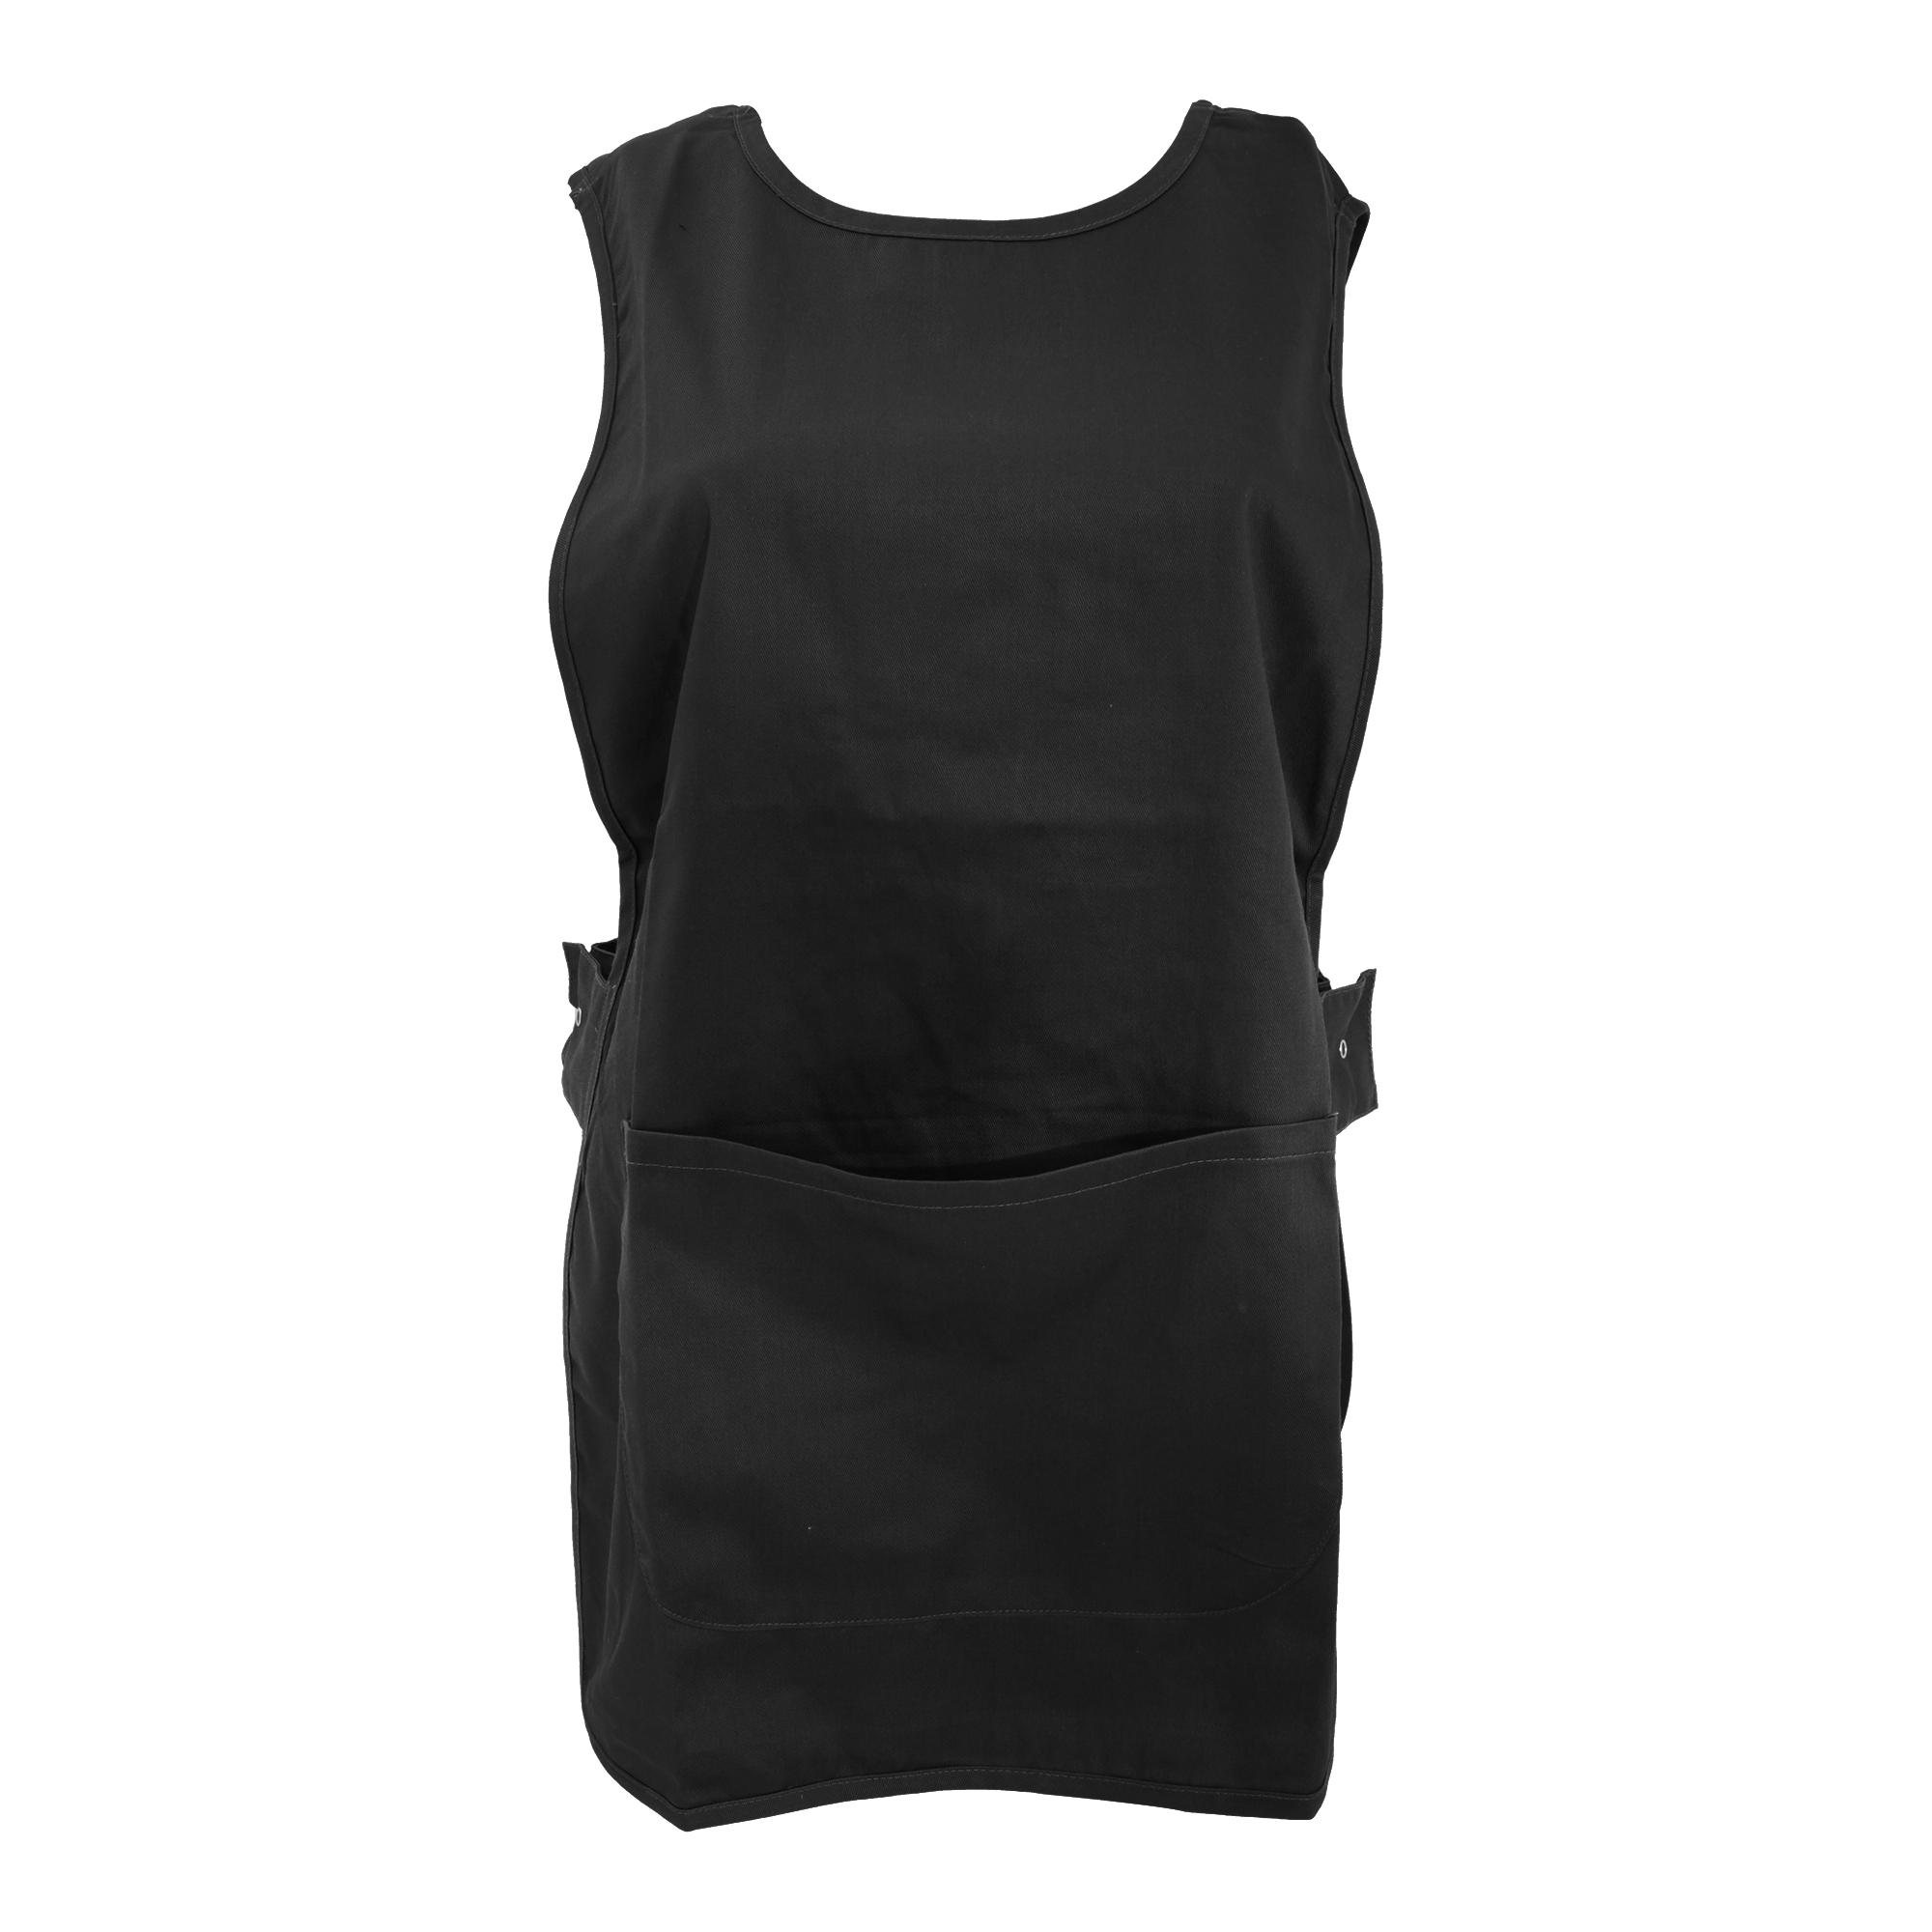 White tabard apron - Davern Mens Womens Pocket Workwear Plain Work Apron